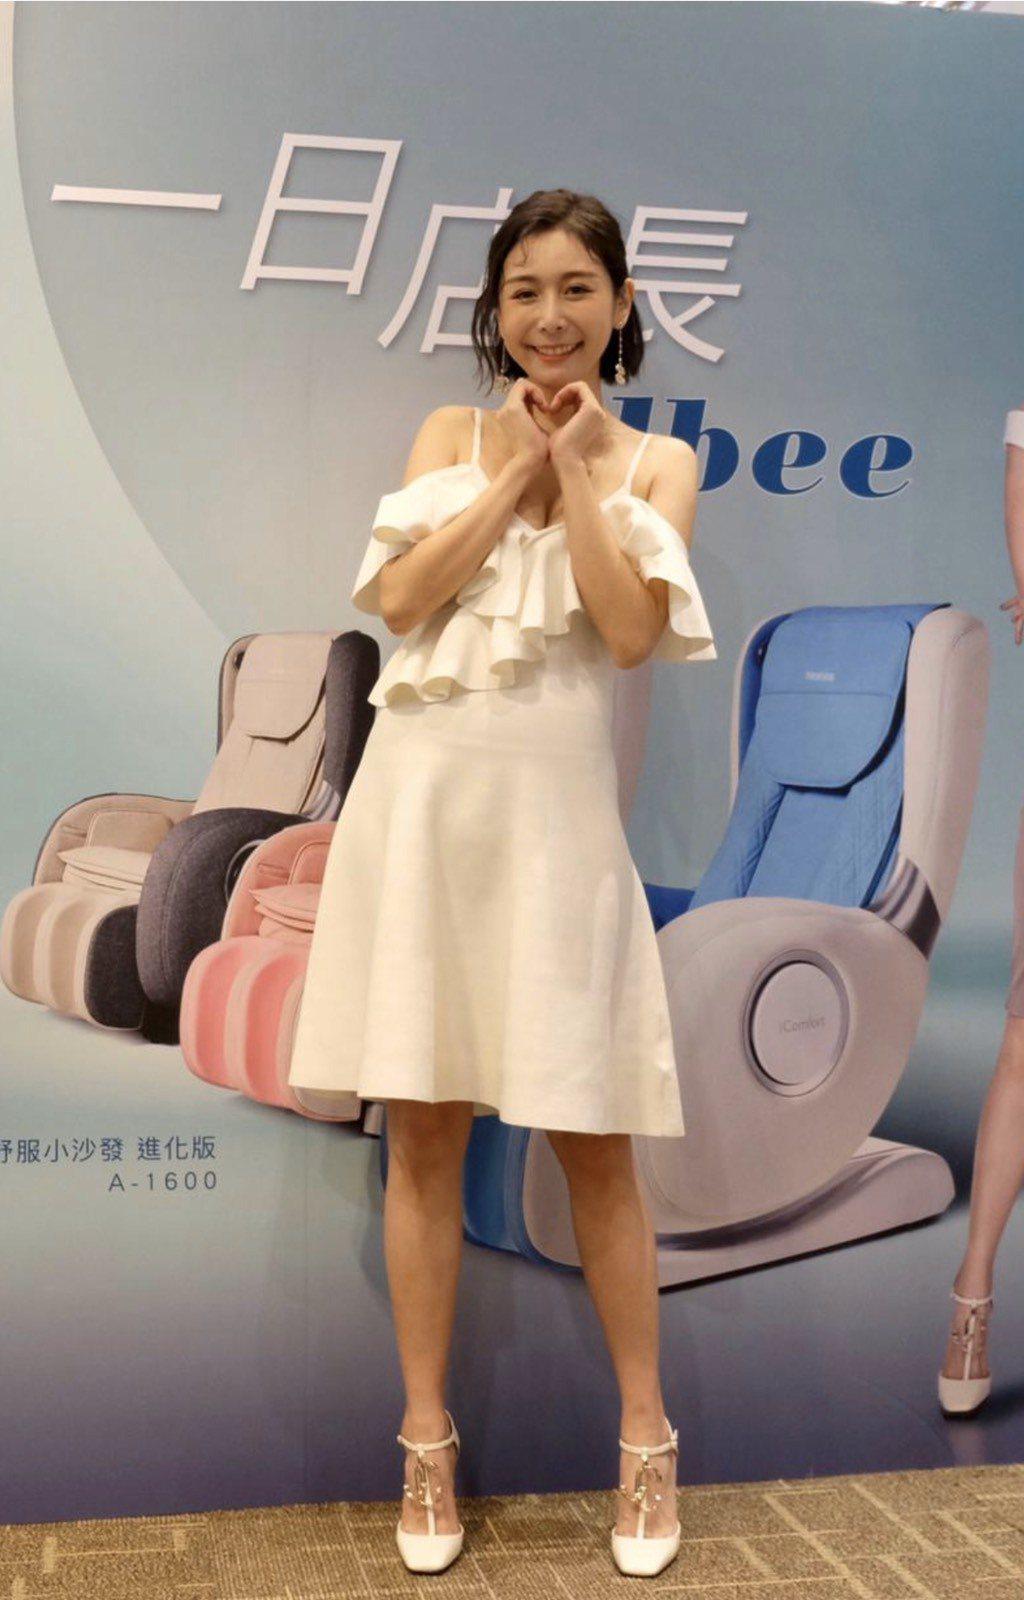 Albee范乙霏(中)出席一日店長活動,現場和粉絲互動,一襲白色洋裝胸部快掉出來